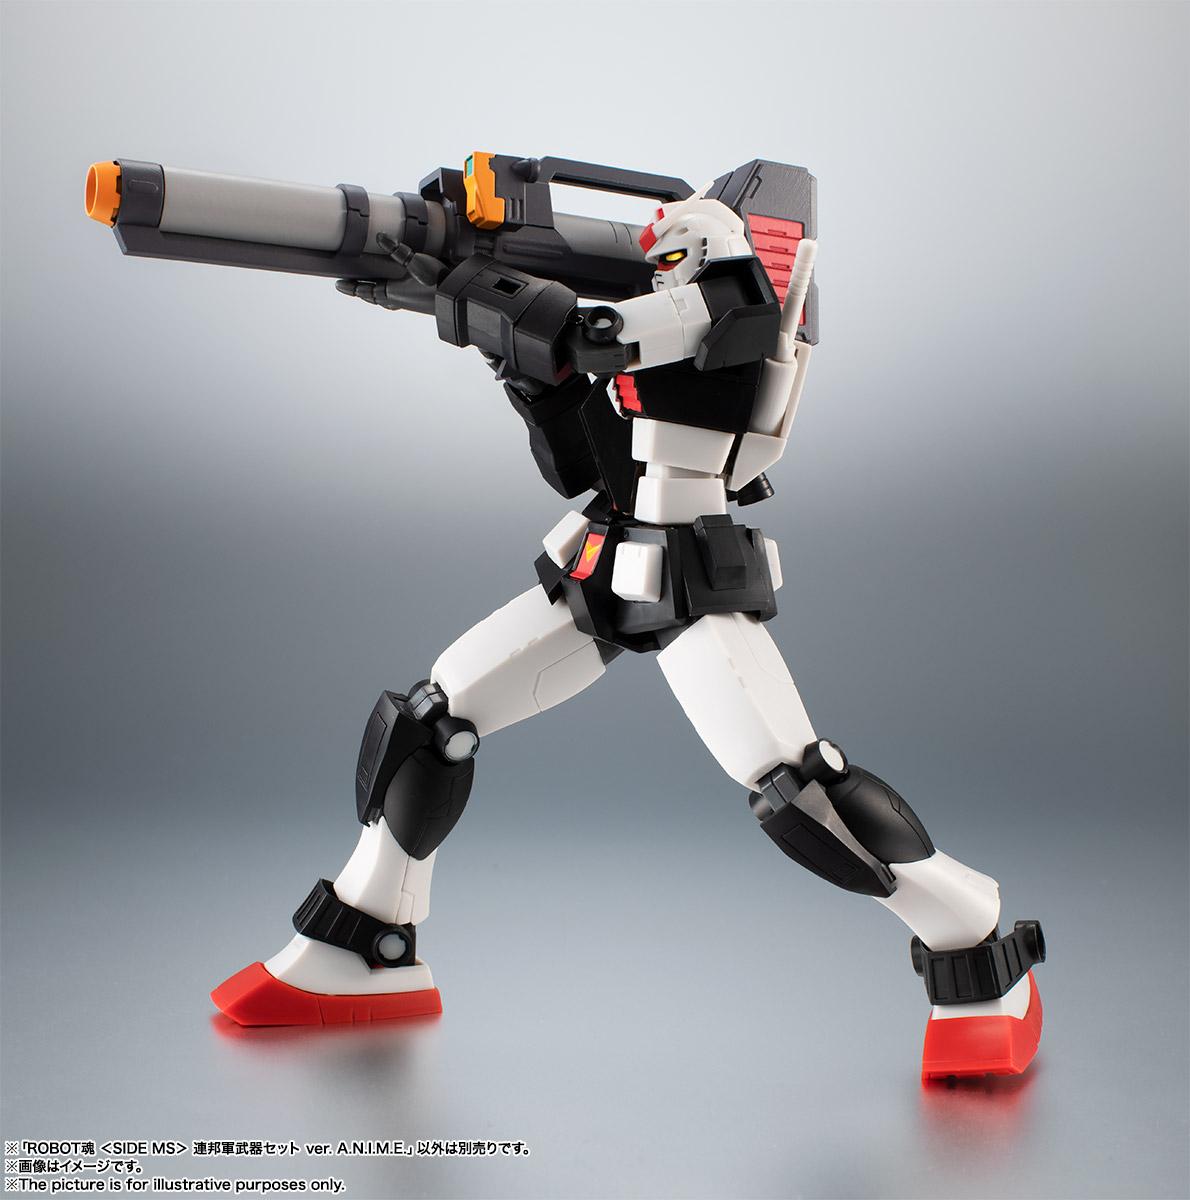 ROBOT魂〈SIDE MS〉『連邦軍武器セット ver. A.N.I.M.E.』ガンダム 完成品フィギュア-008